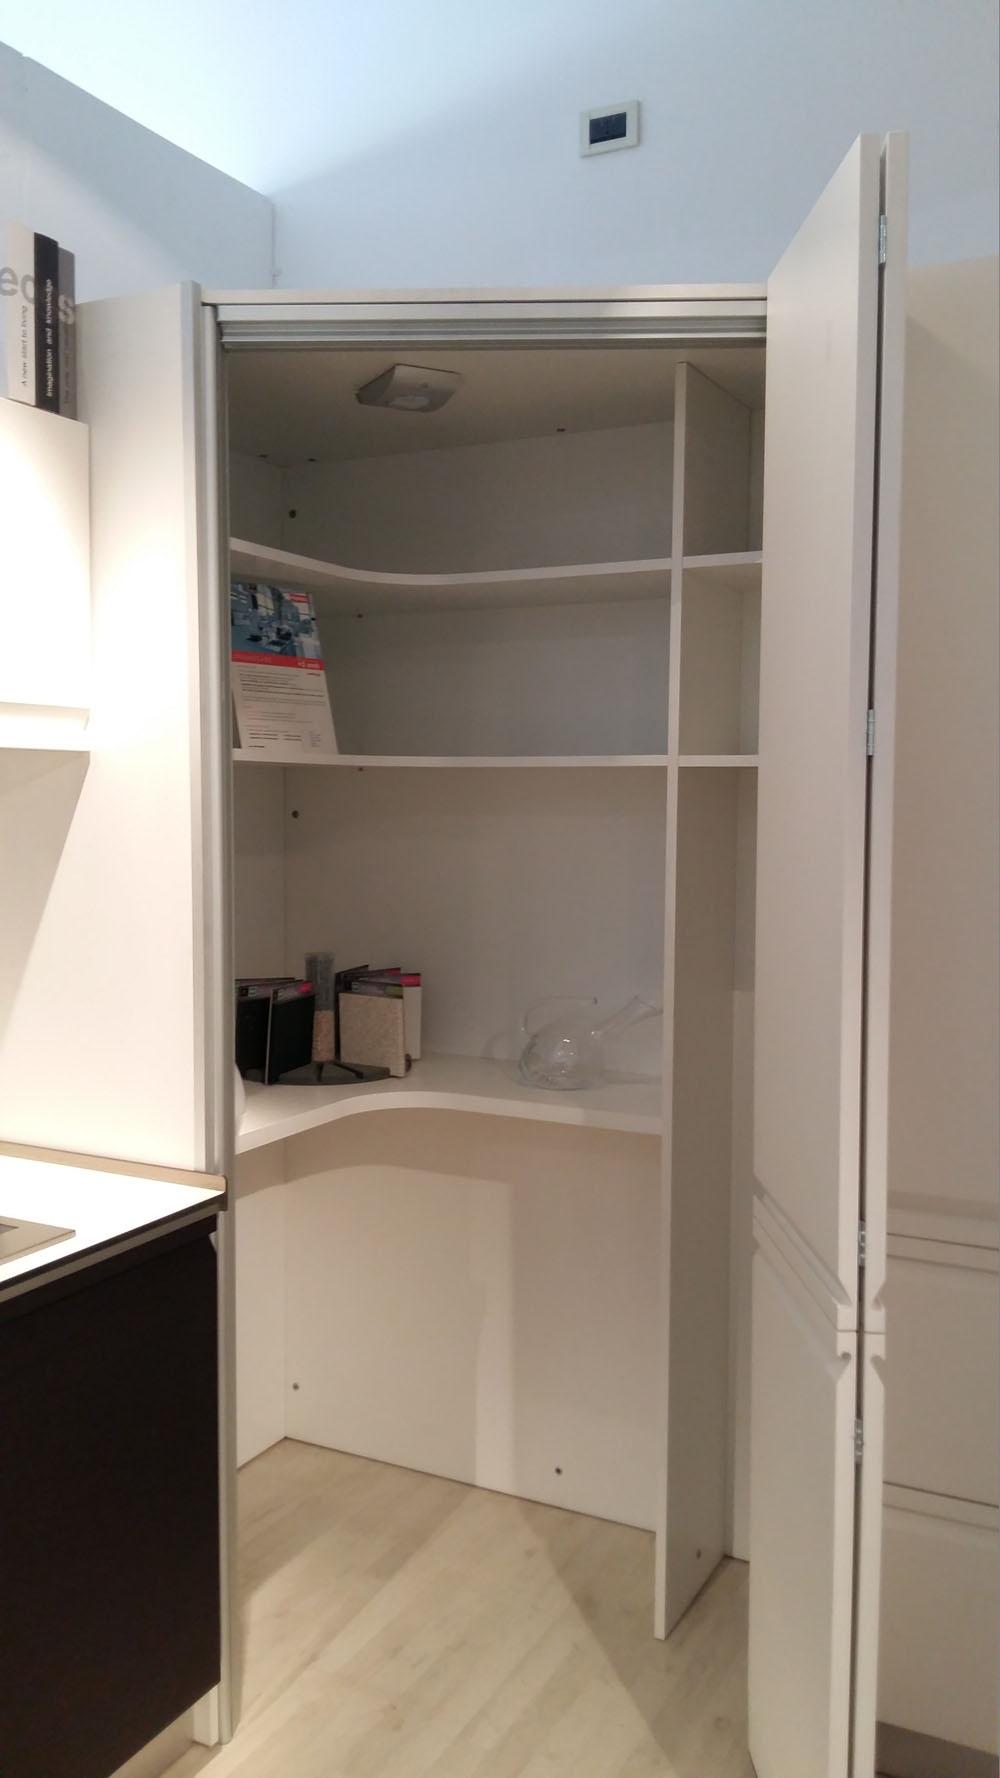 Cucina angolo dibiesse scontata del 63 laccata bianca - Cucina bianca legno ...